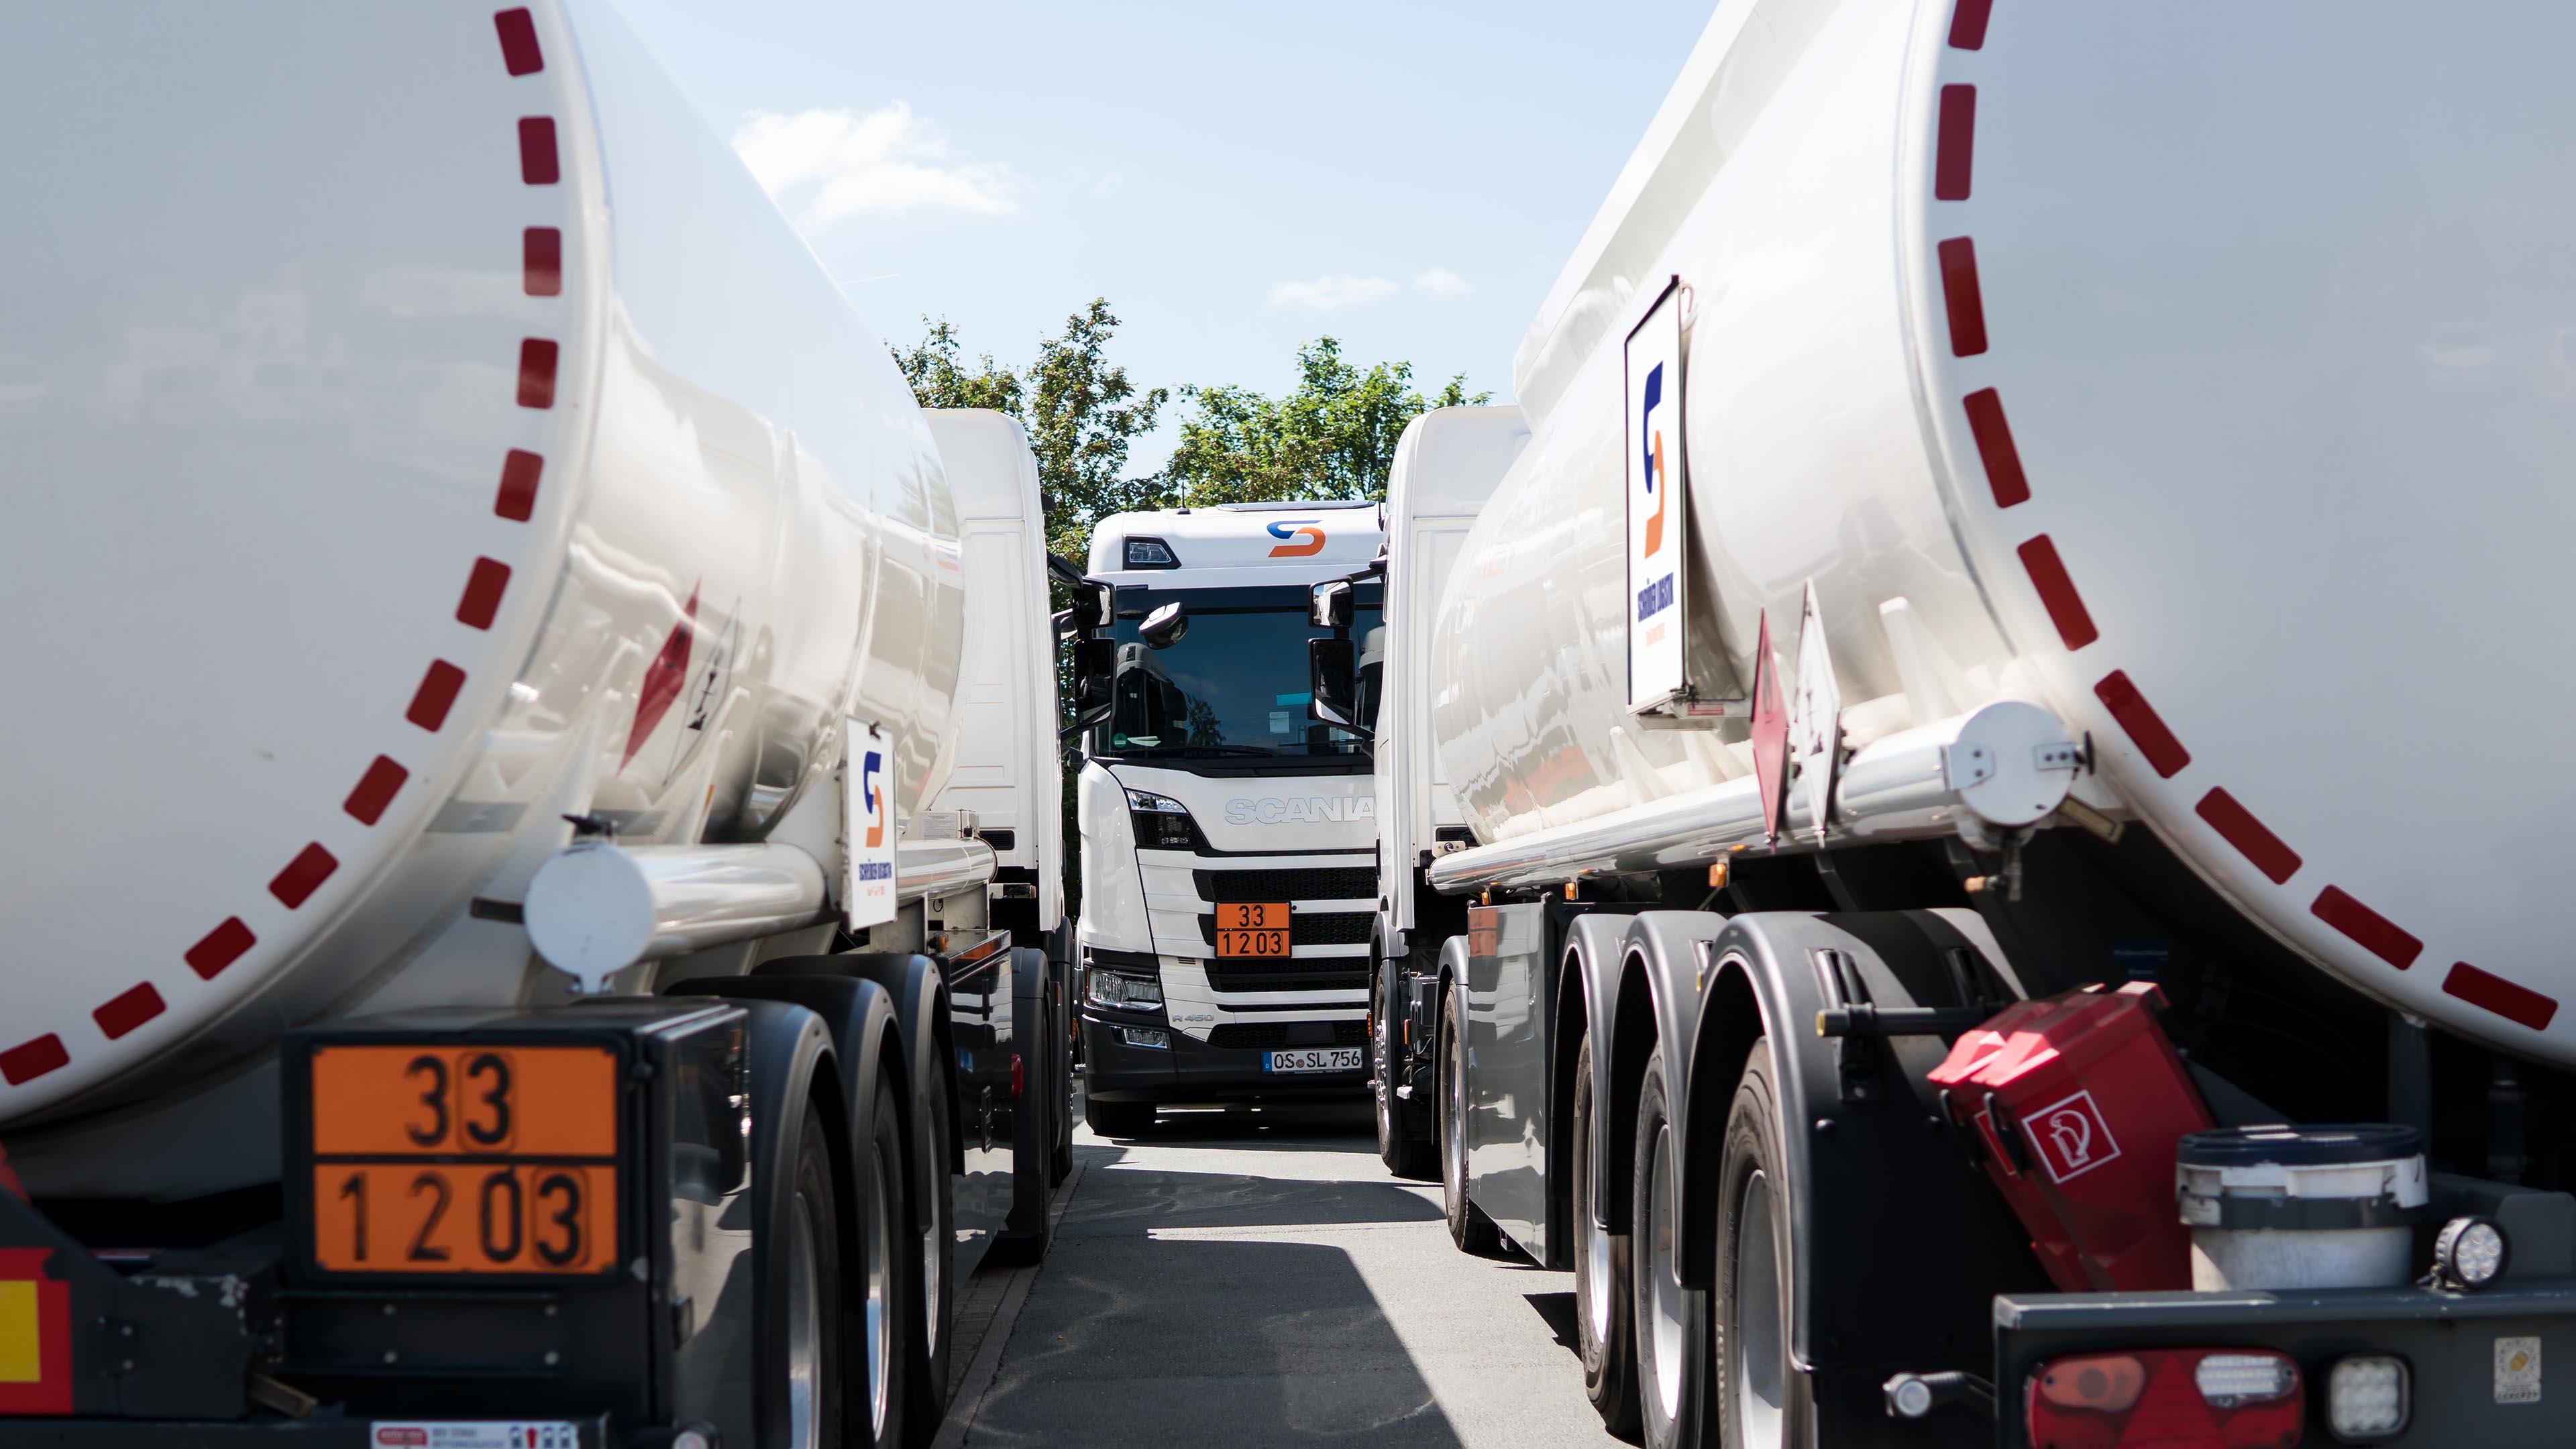 Schröder Logistik Tanktransporte 24 Stunden, Mengenplanung und Gefahrgut